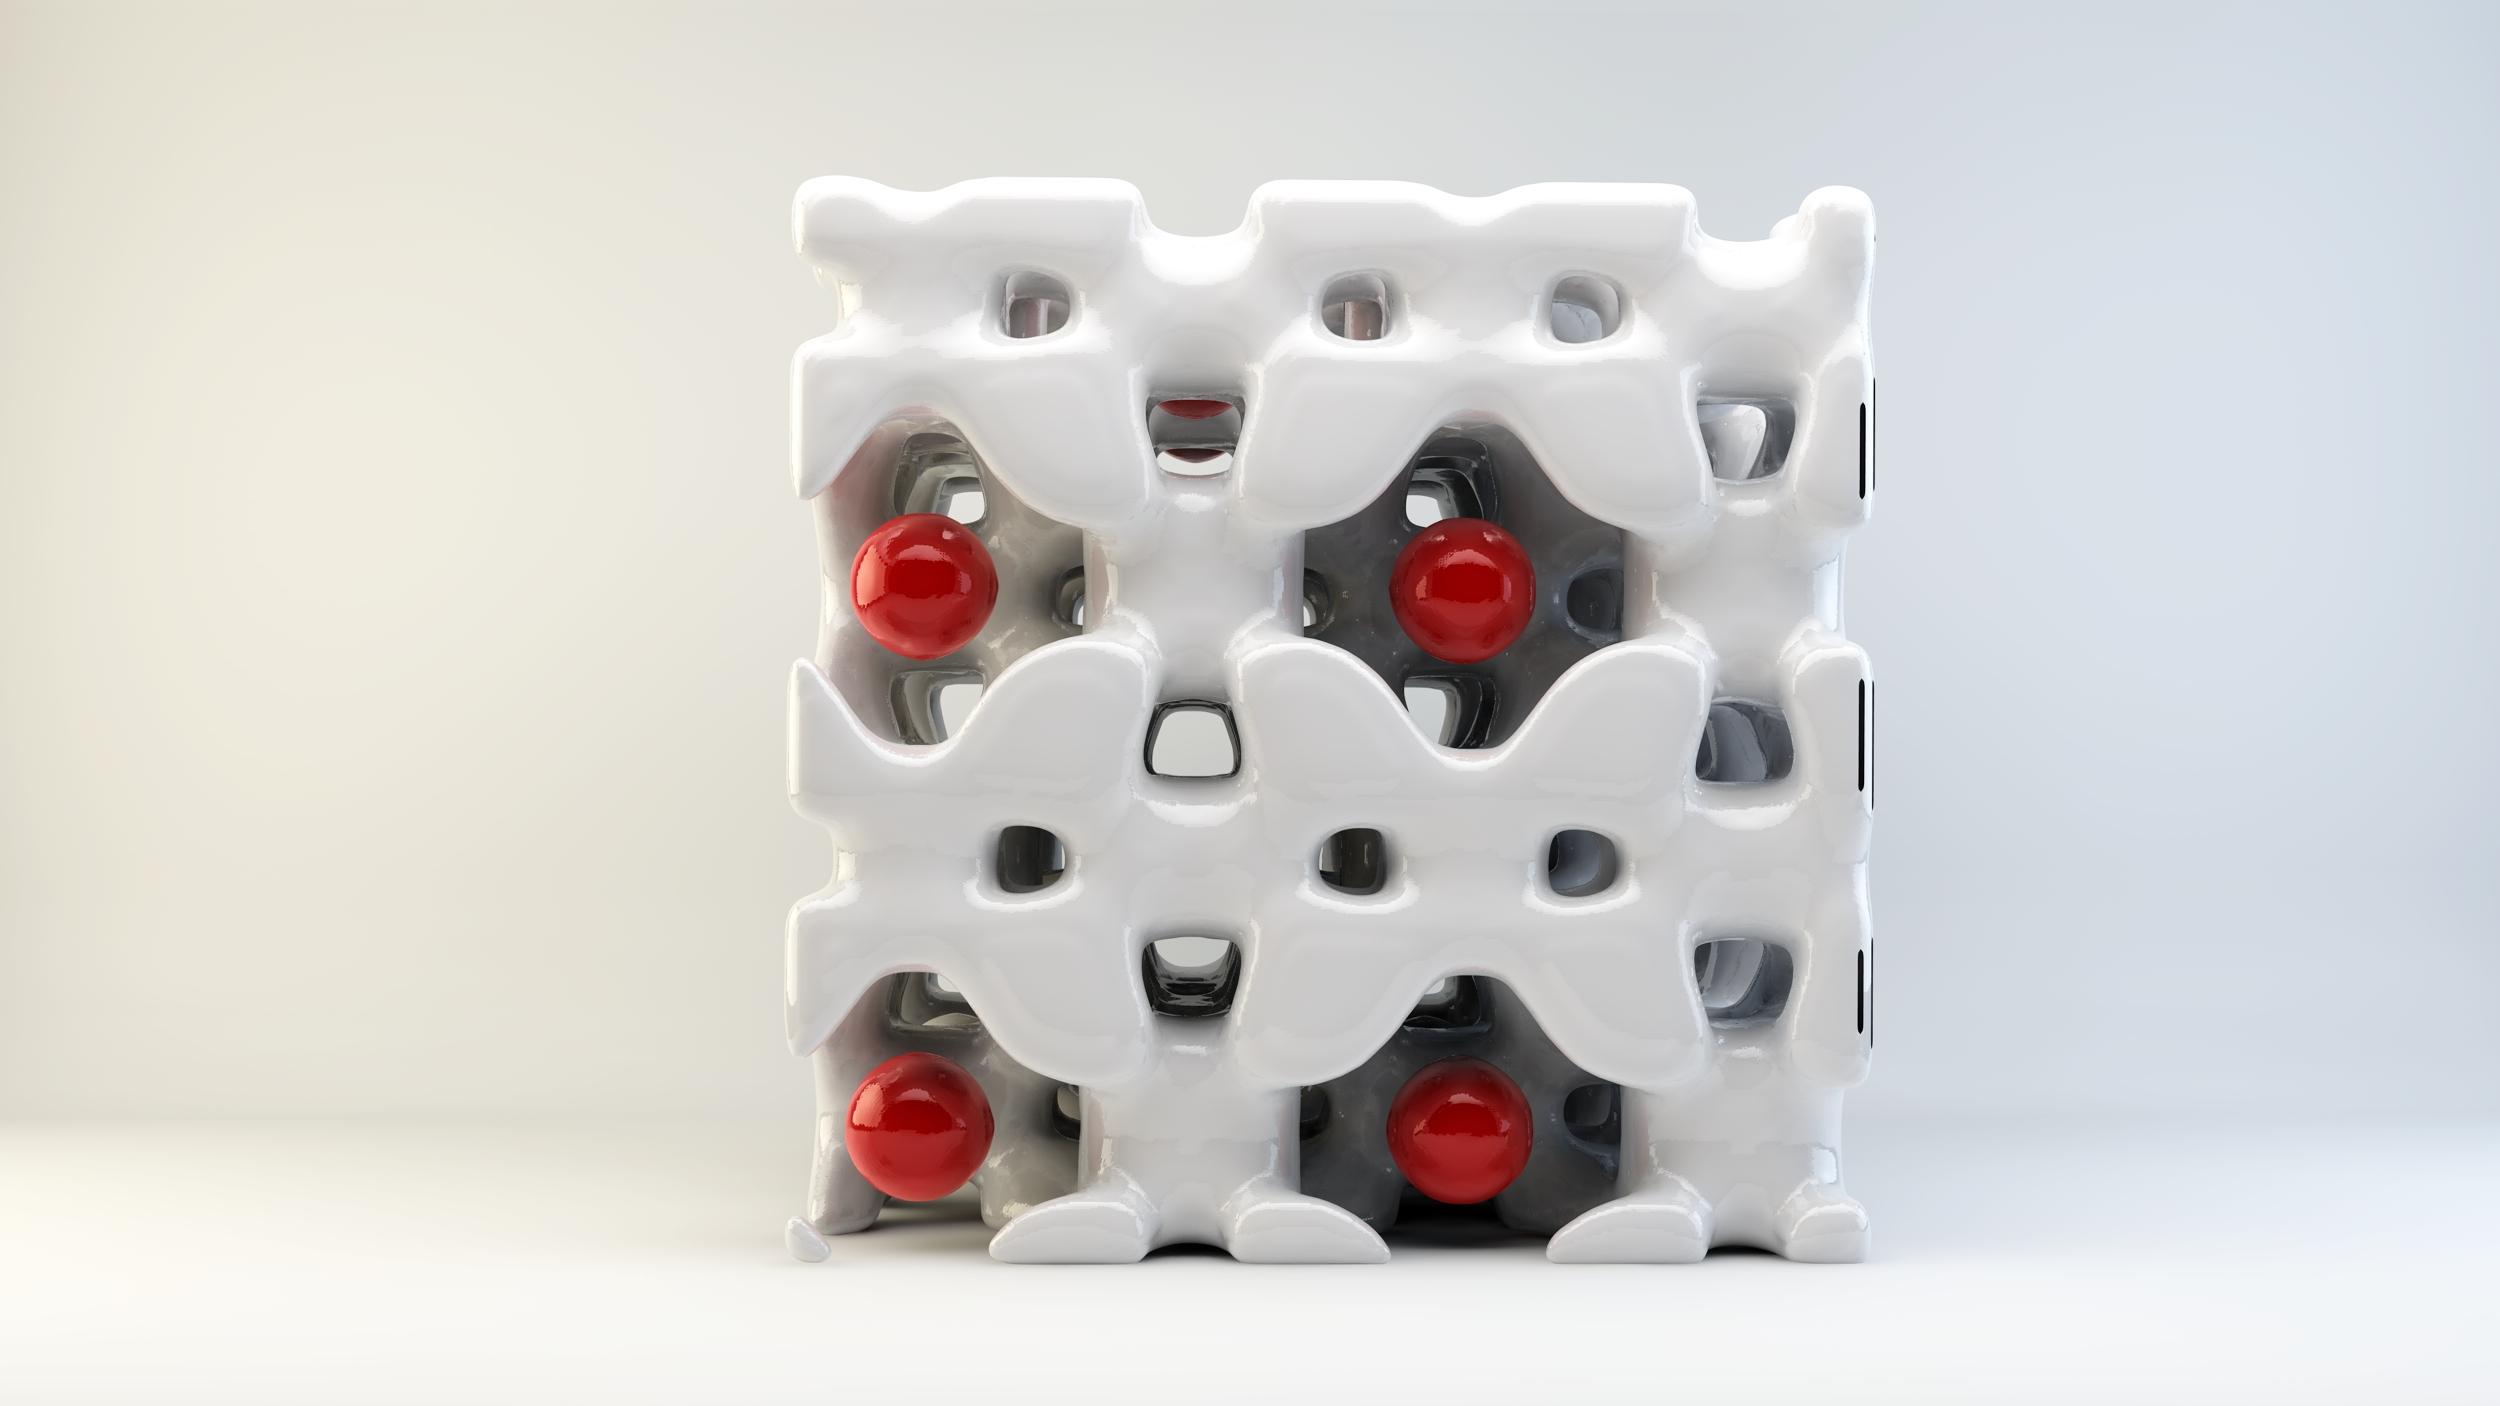 MANDELBULB 3D BASE MESH by nic022